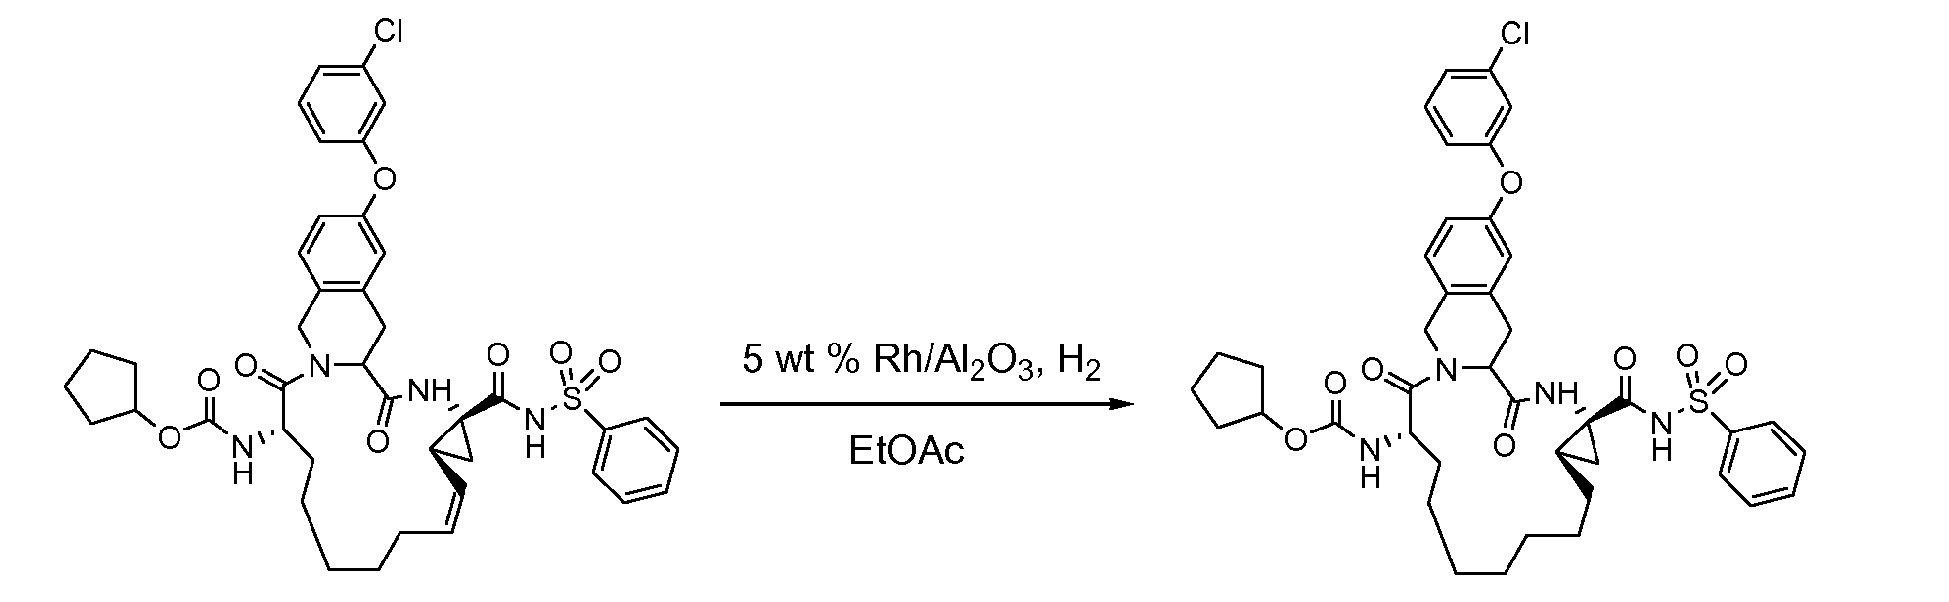 Figure imgb0588